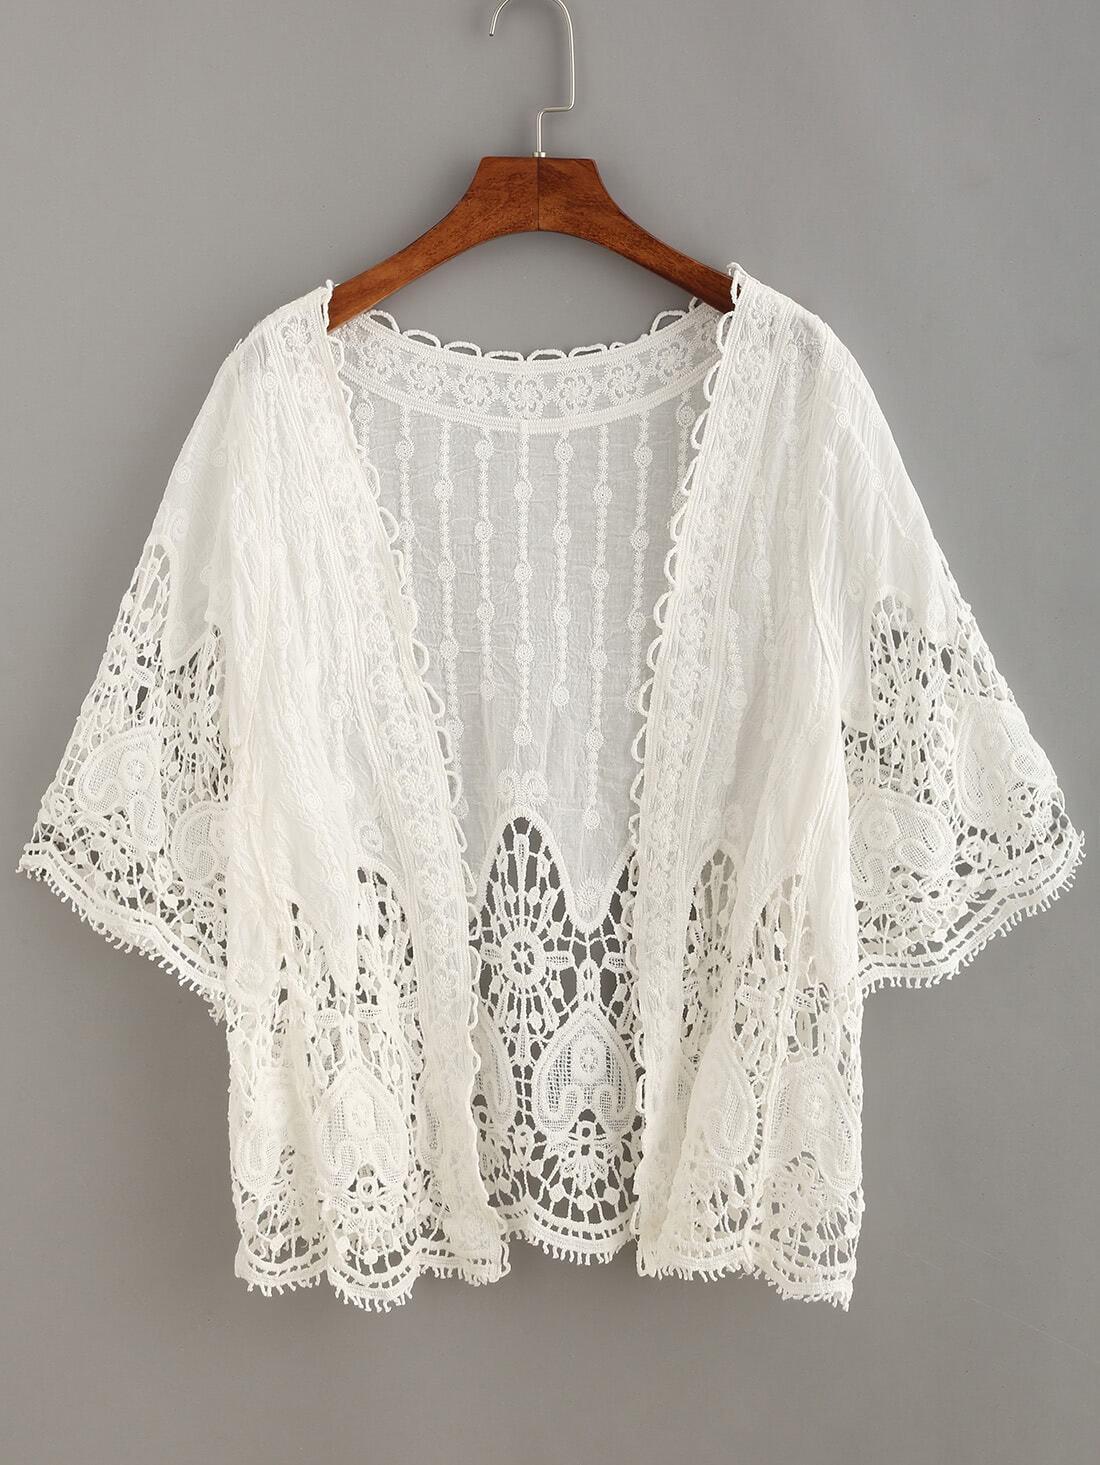 Купить Crochet Insert Hollow Out Top